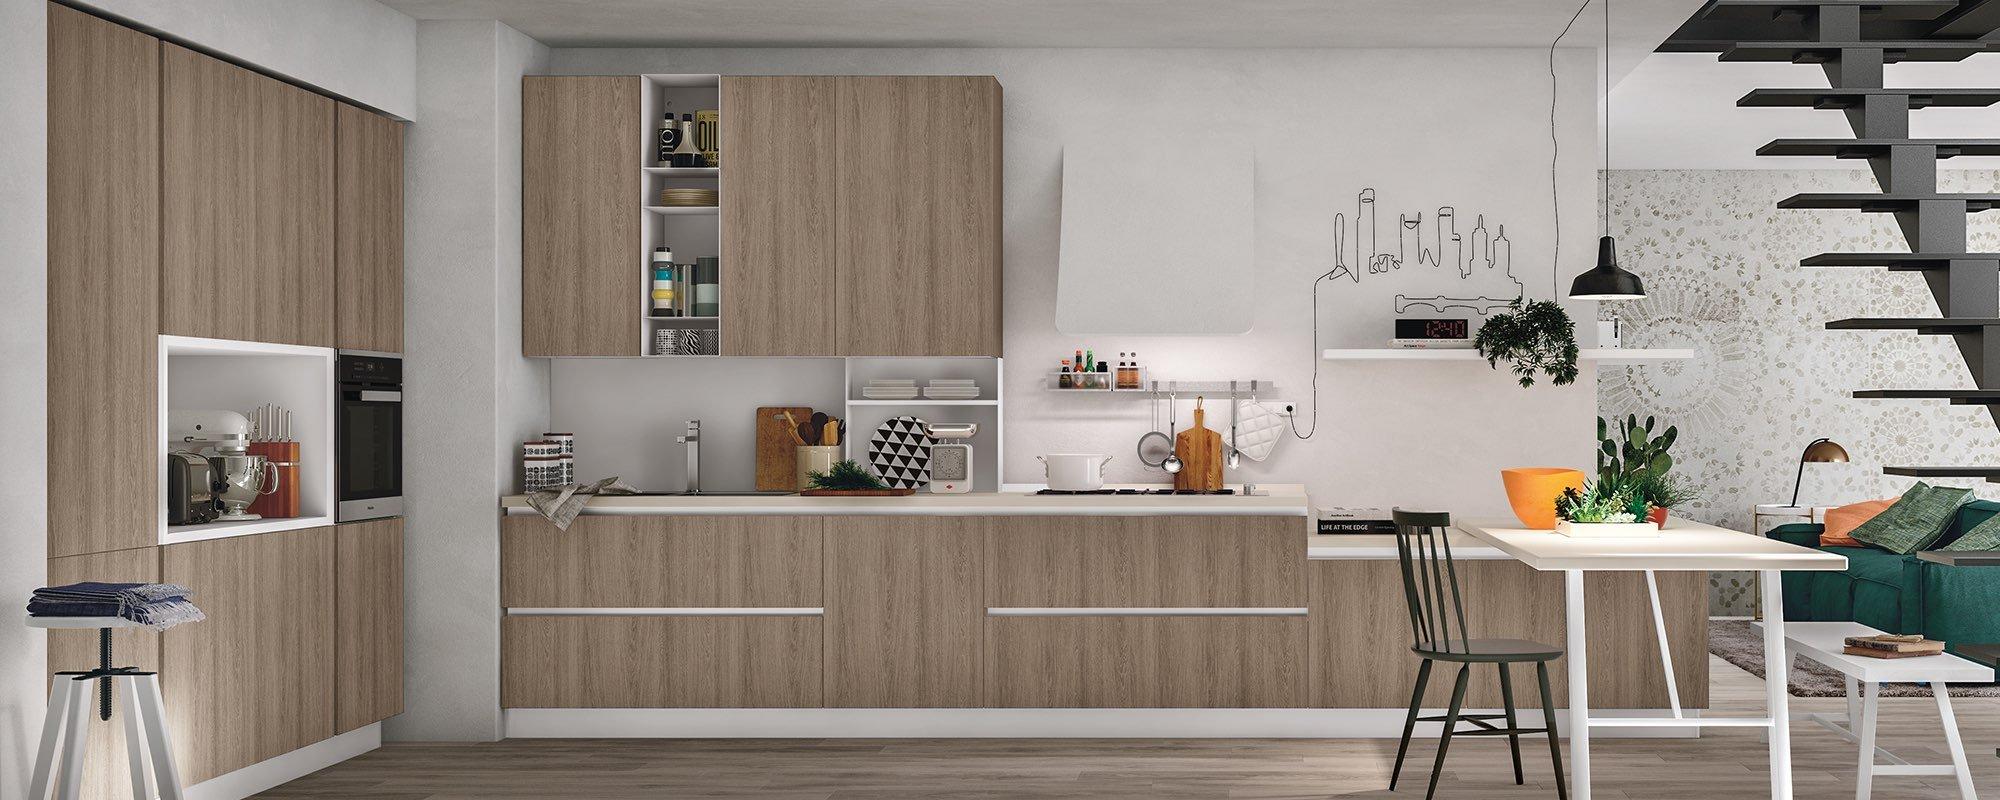 cucina moderna e classica color legno